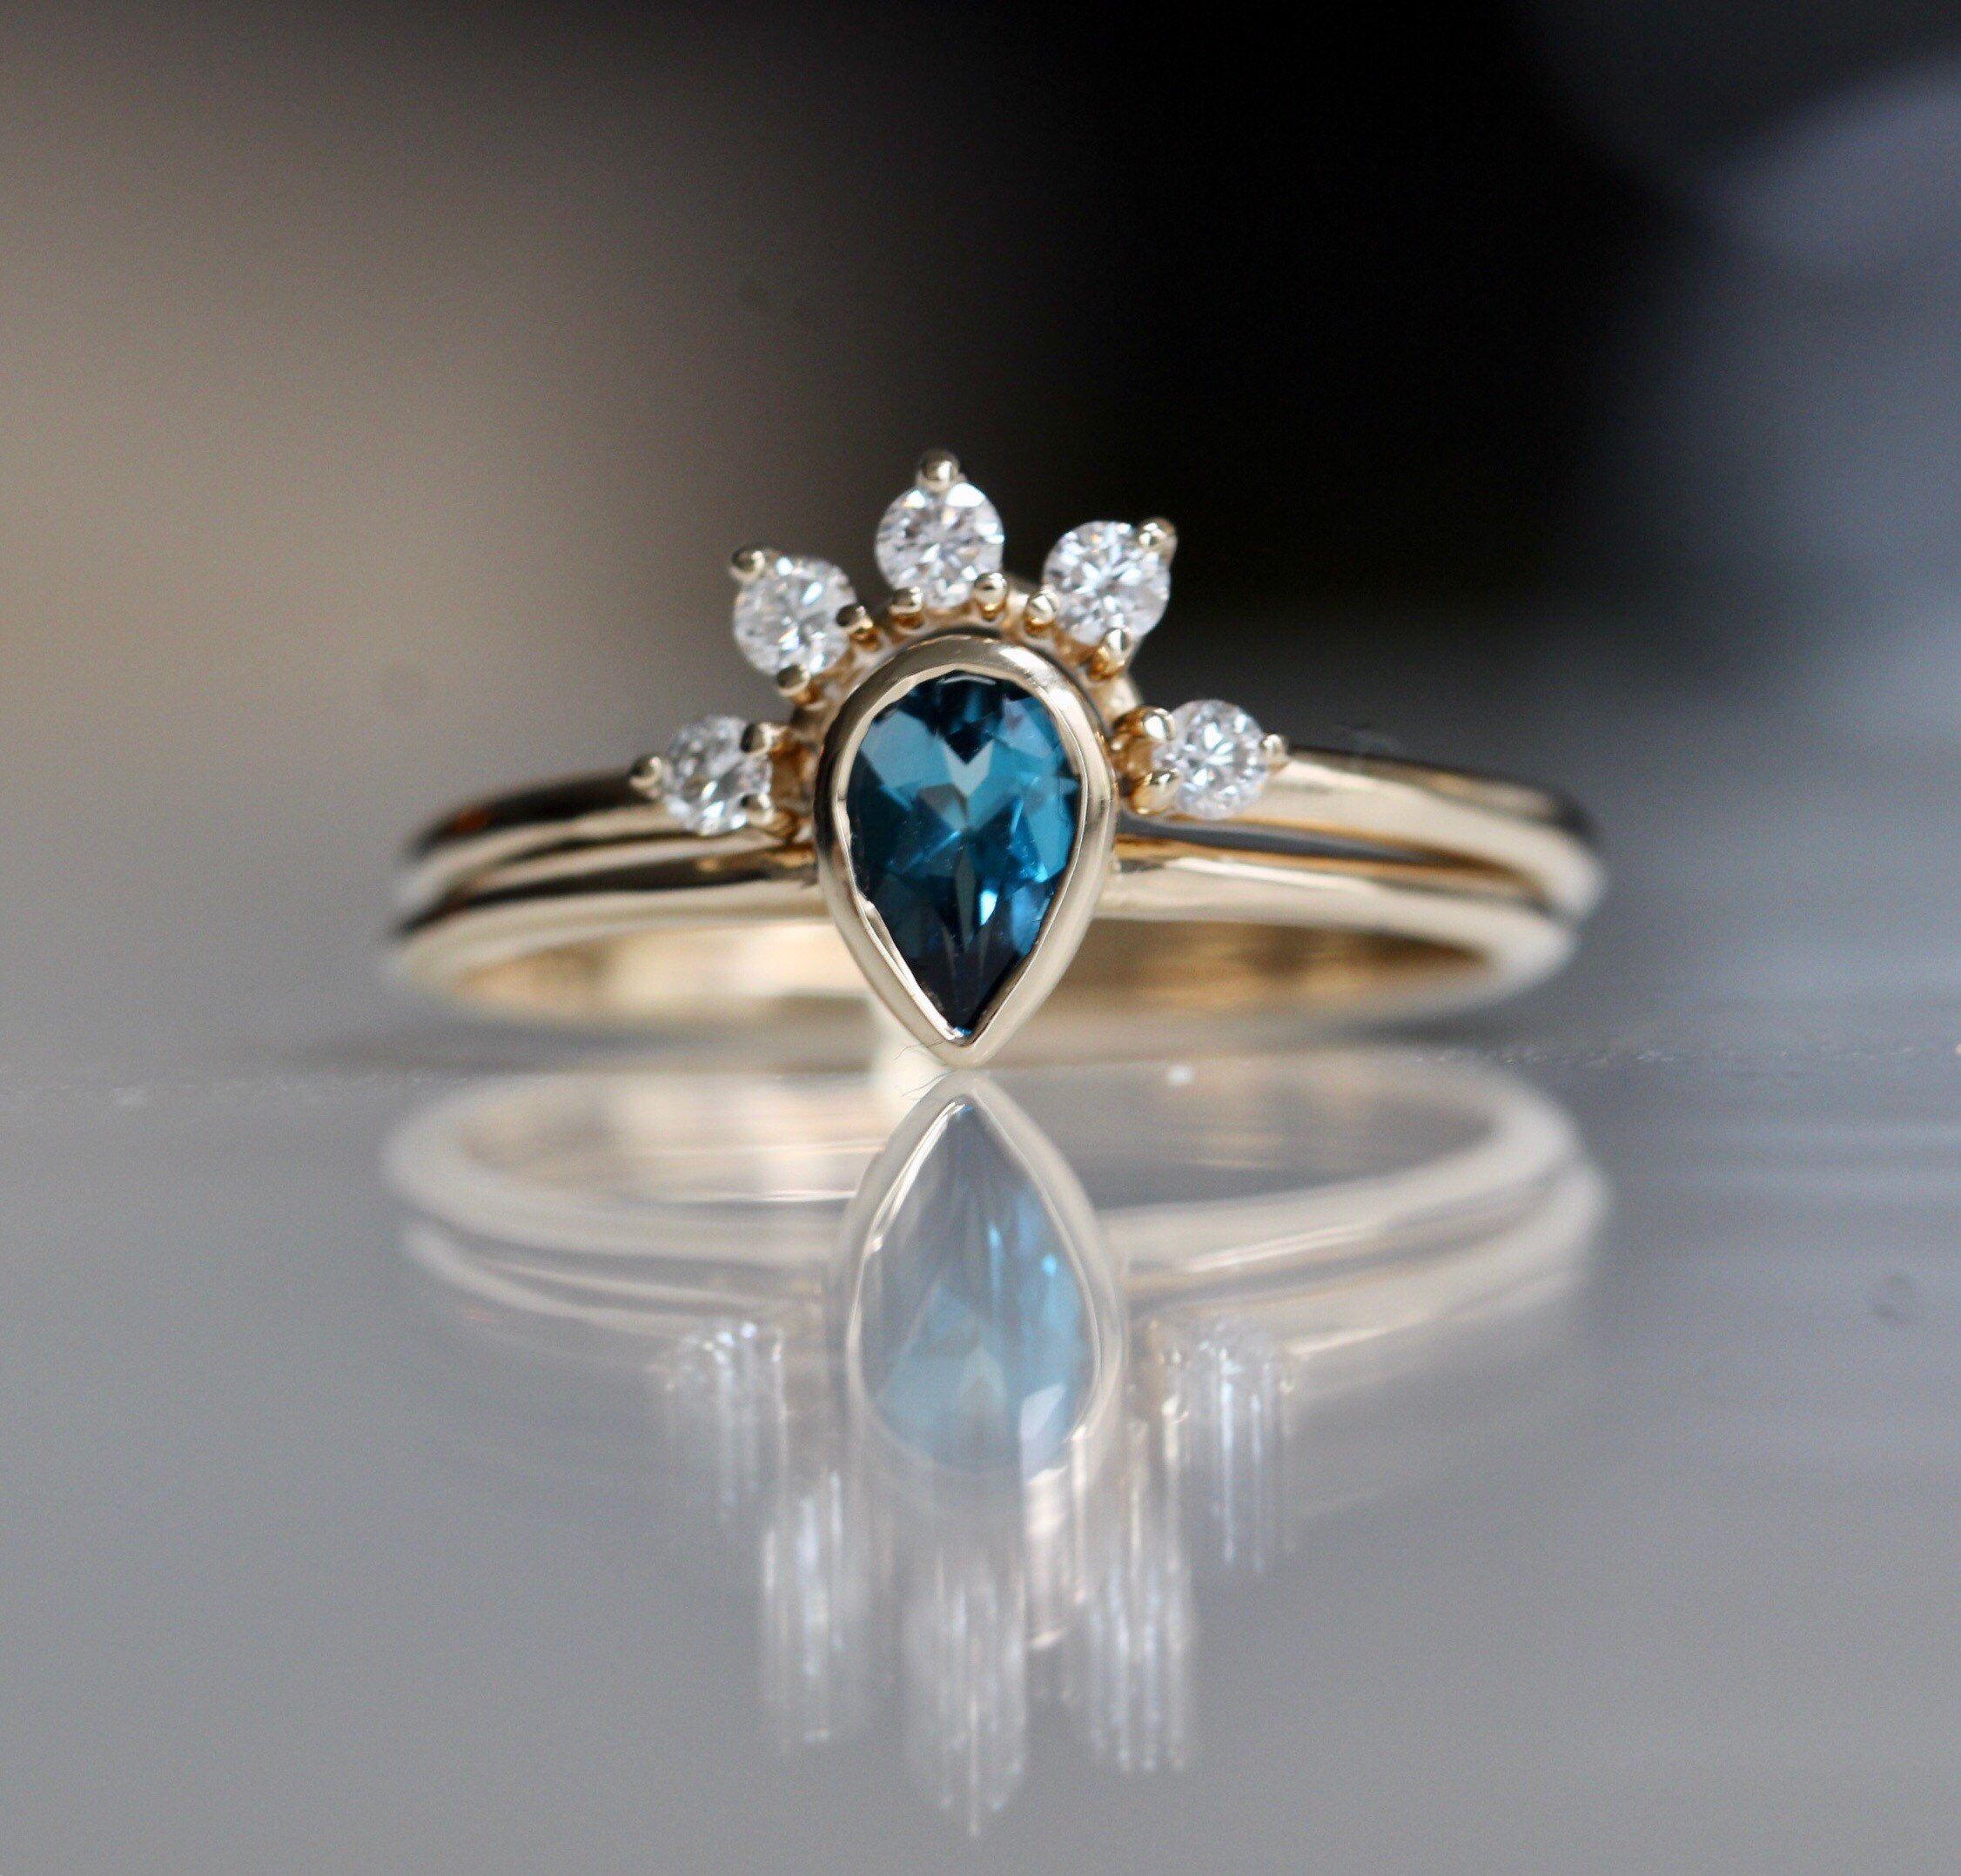 14k Gold London Blue Topaz Bridal Set Wedding Ring Set Pear Etsy London Blue Topaz Ring Bridesmaid Jewelry Sets Blue Topaz Ring